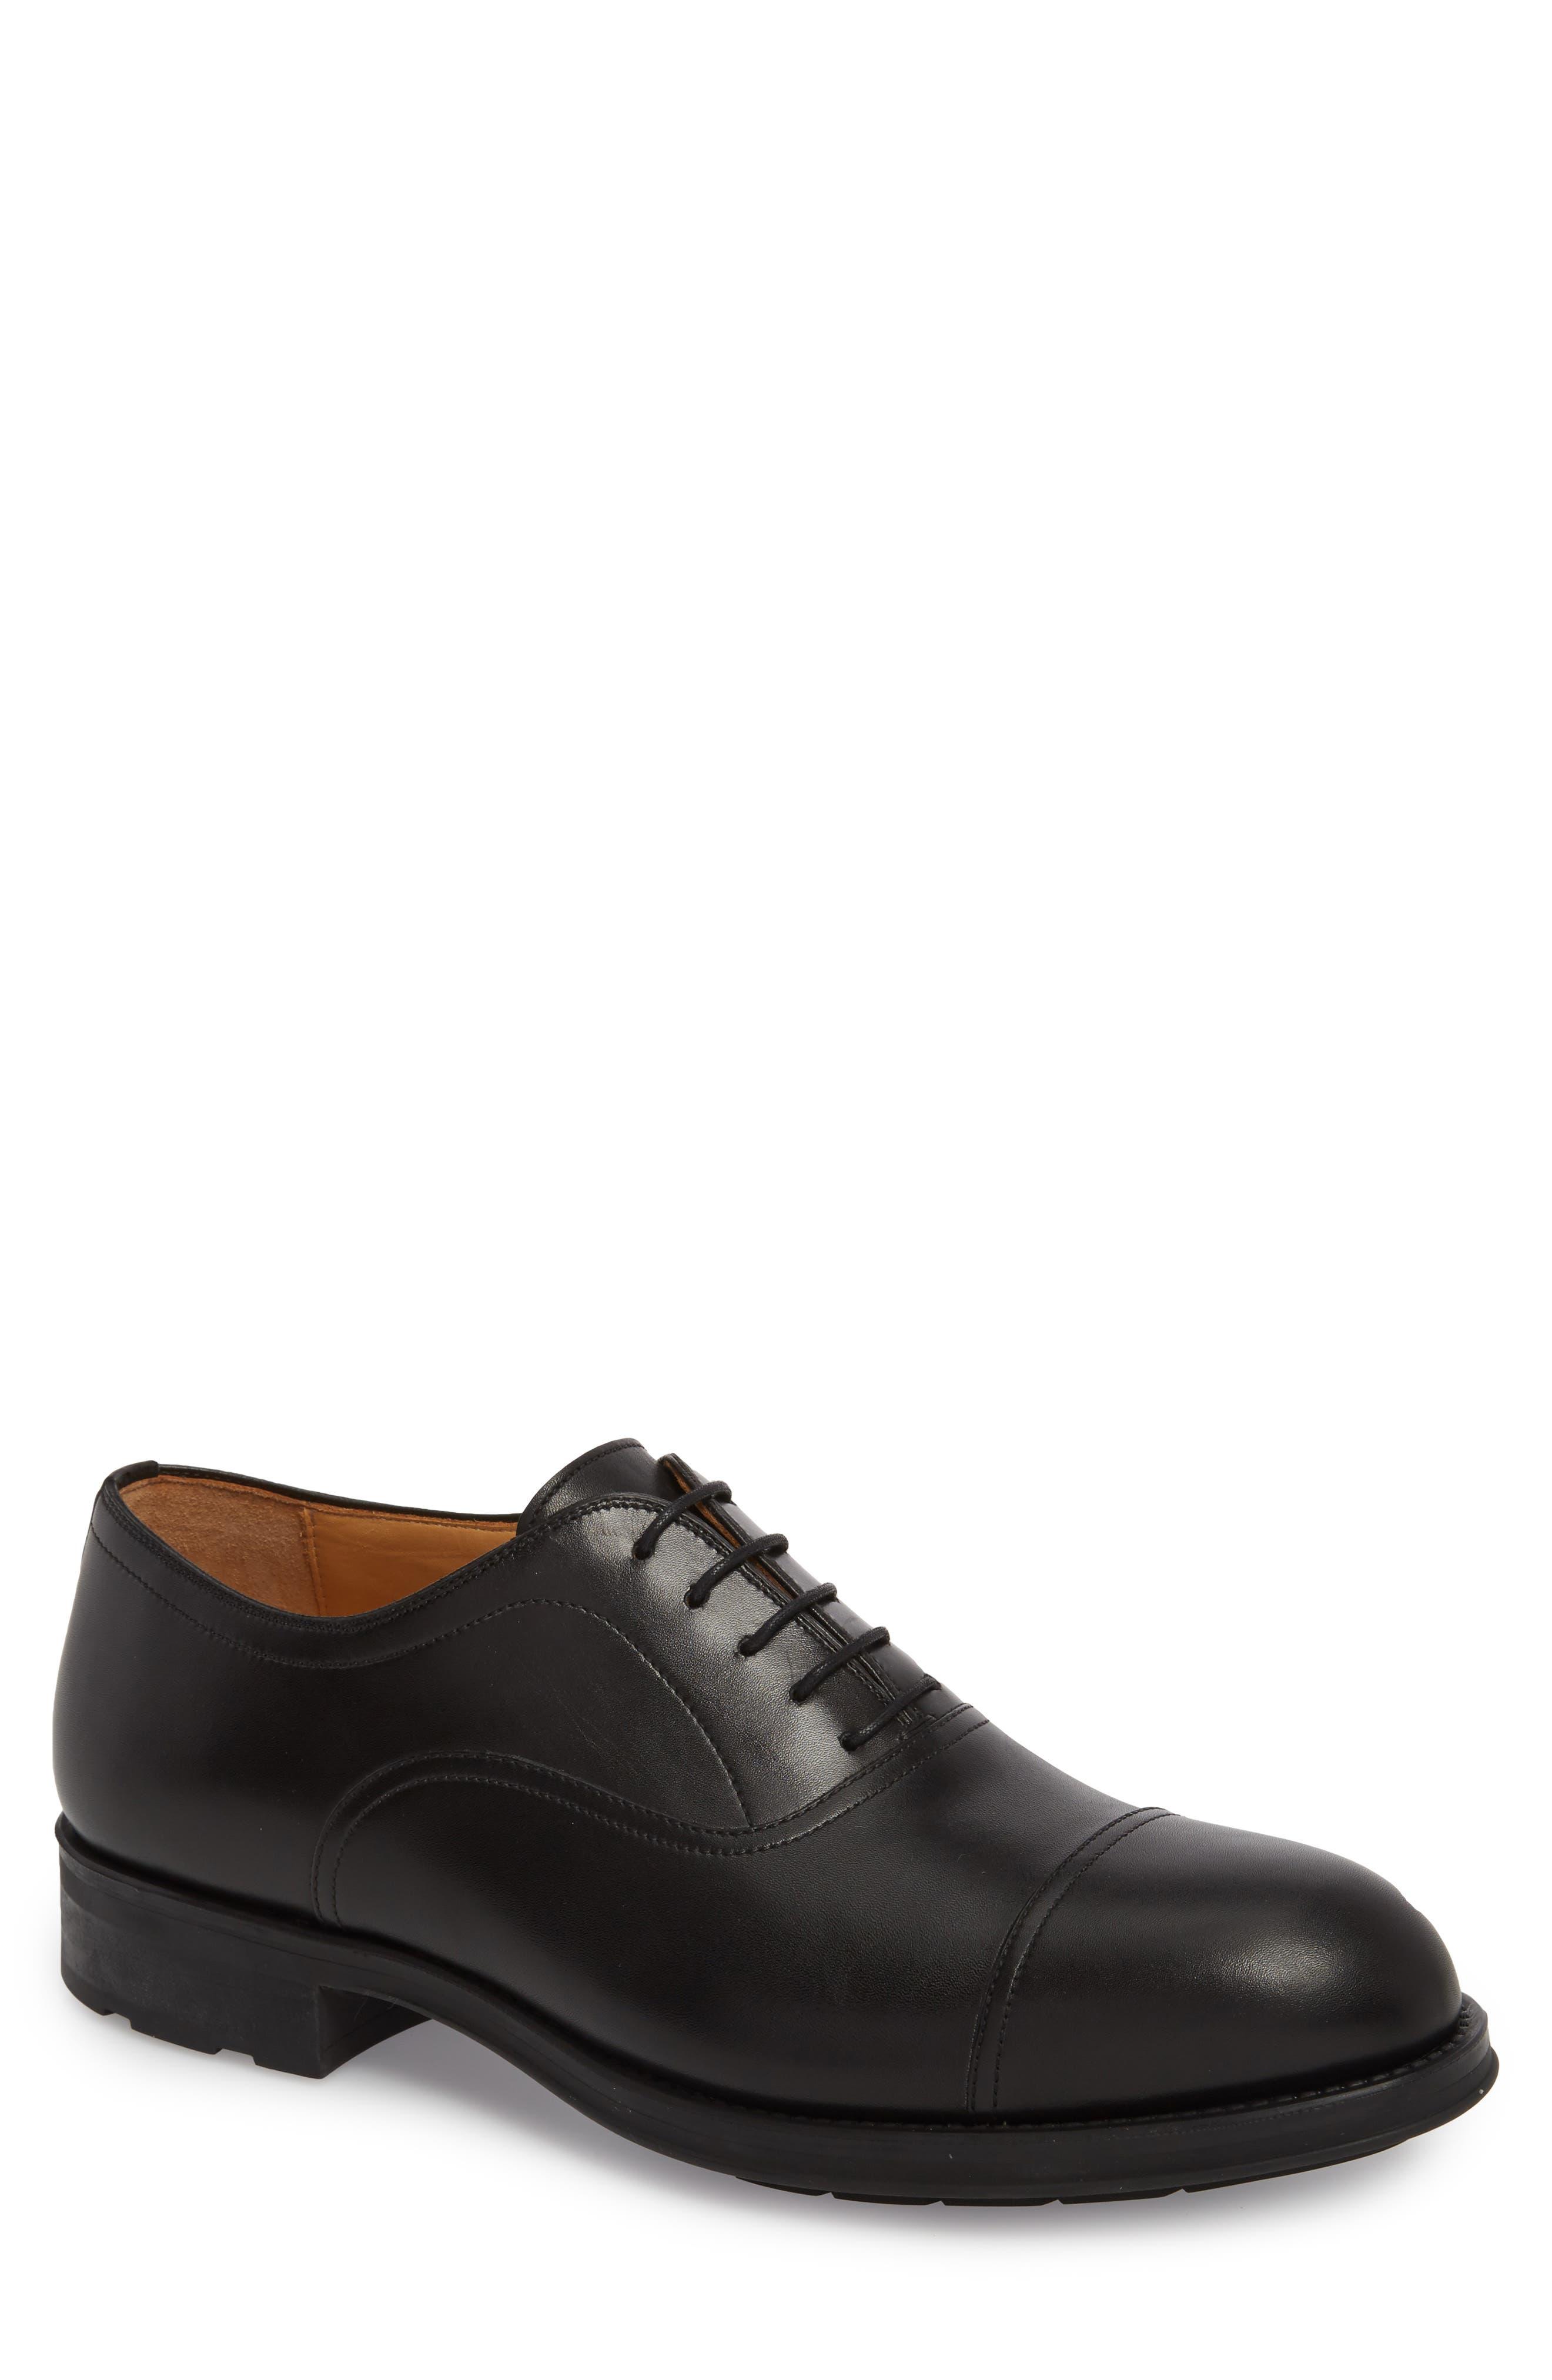 Tadeo Cap Toe Oxford,                             Main thumbnail 1, color,                             Black Leather